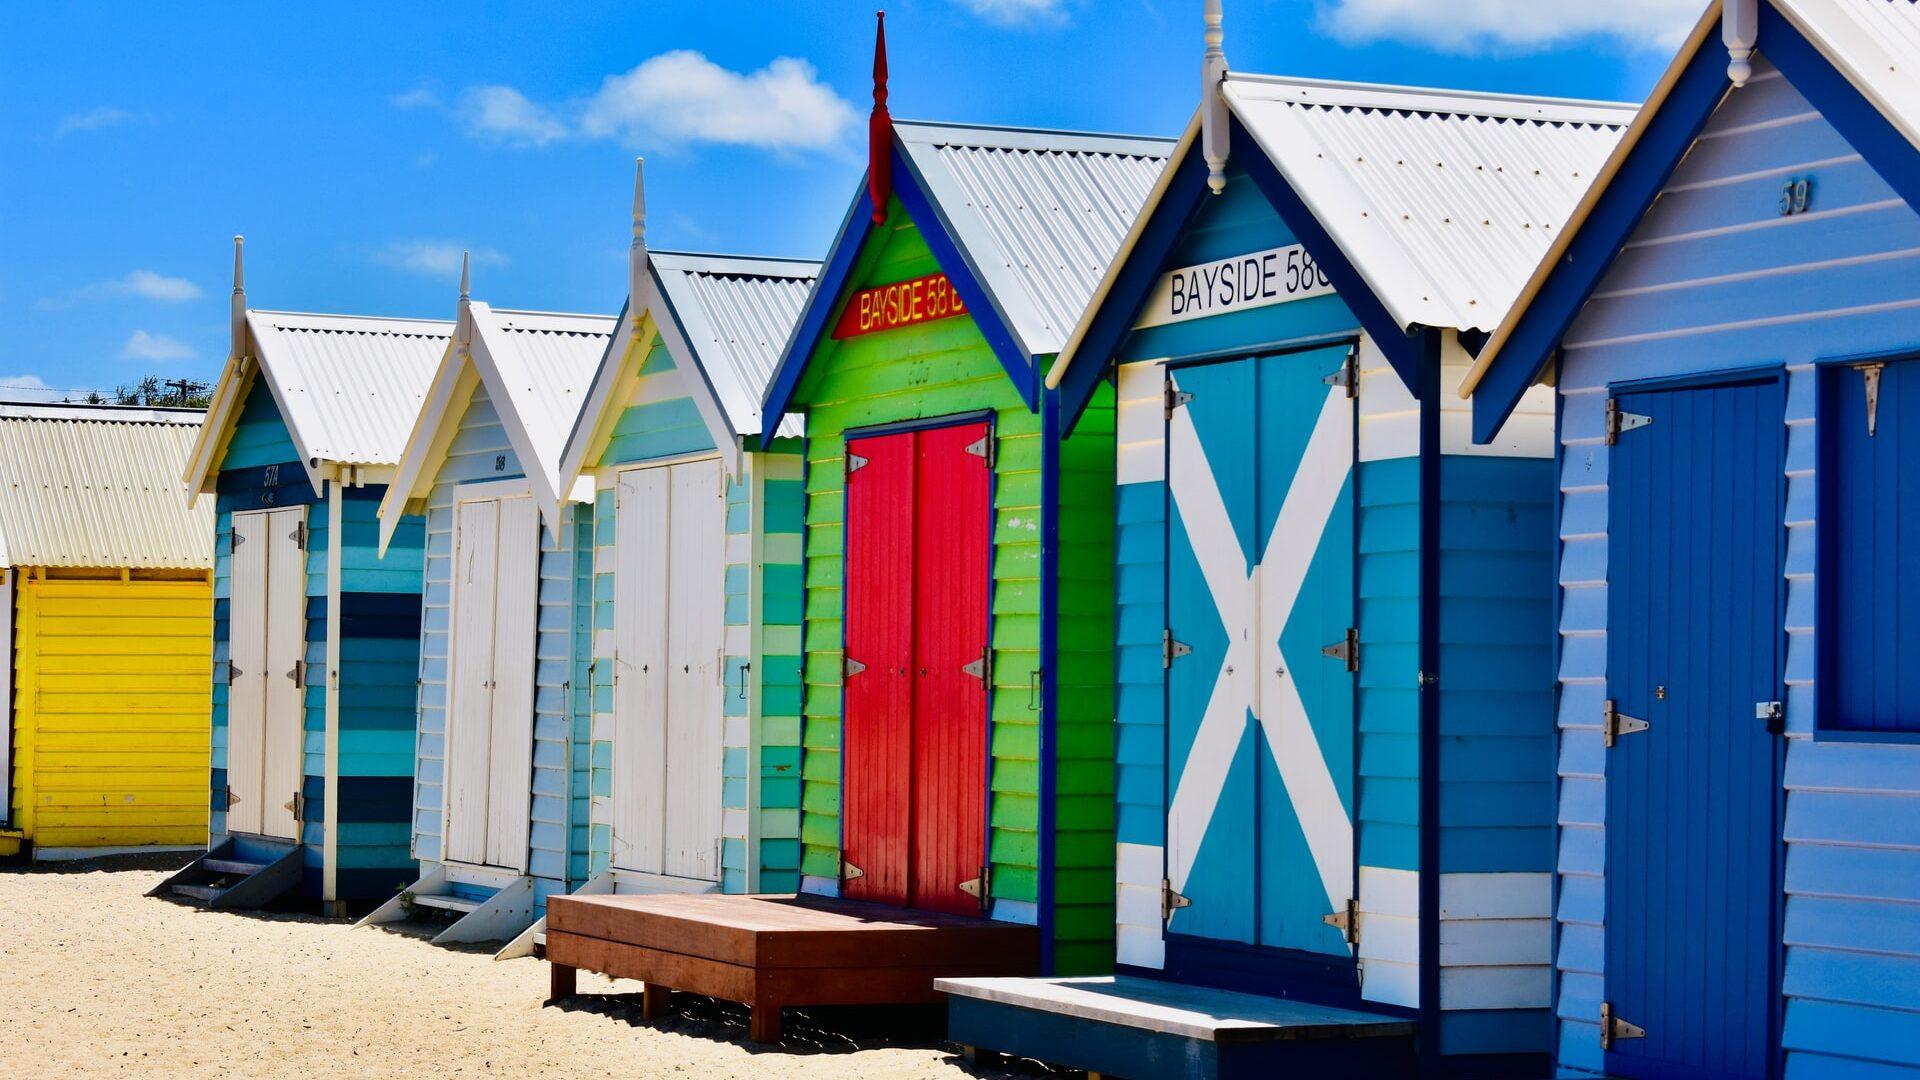 Jalan Jalan ke Melbourne: 20 Tempat Seru yang Wajib Dikunjungi